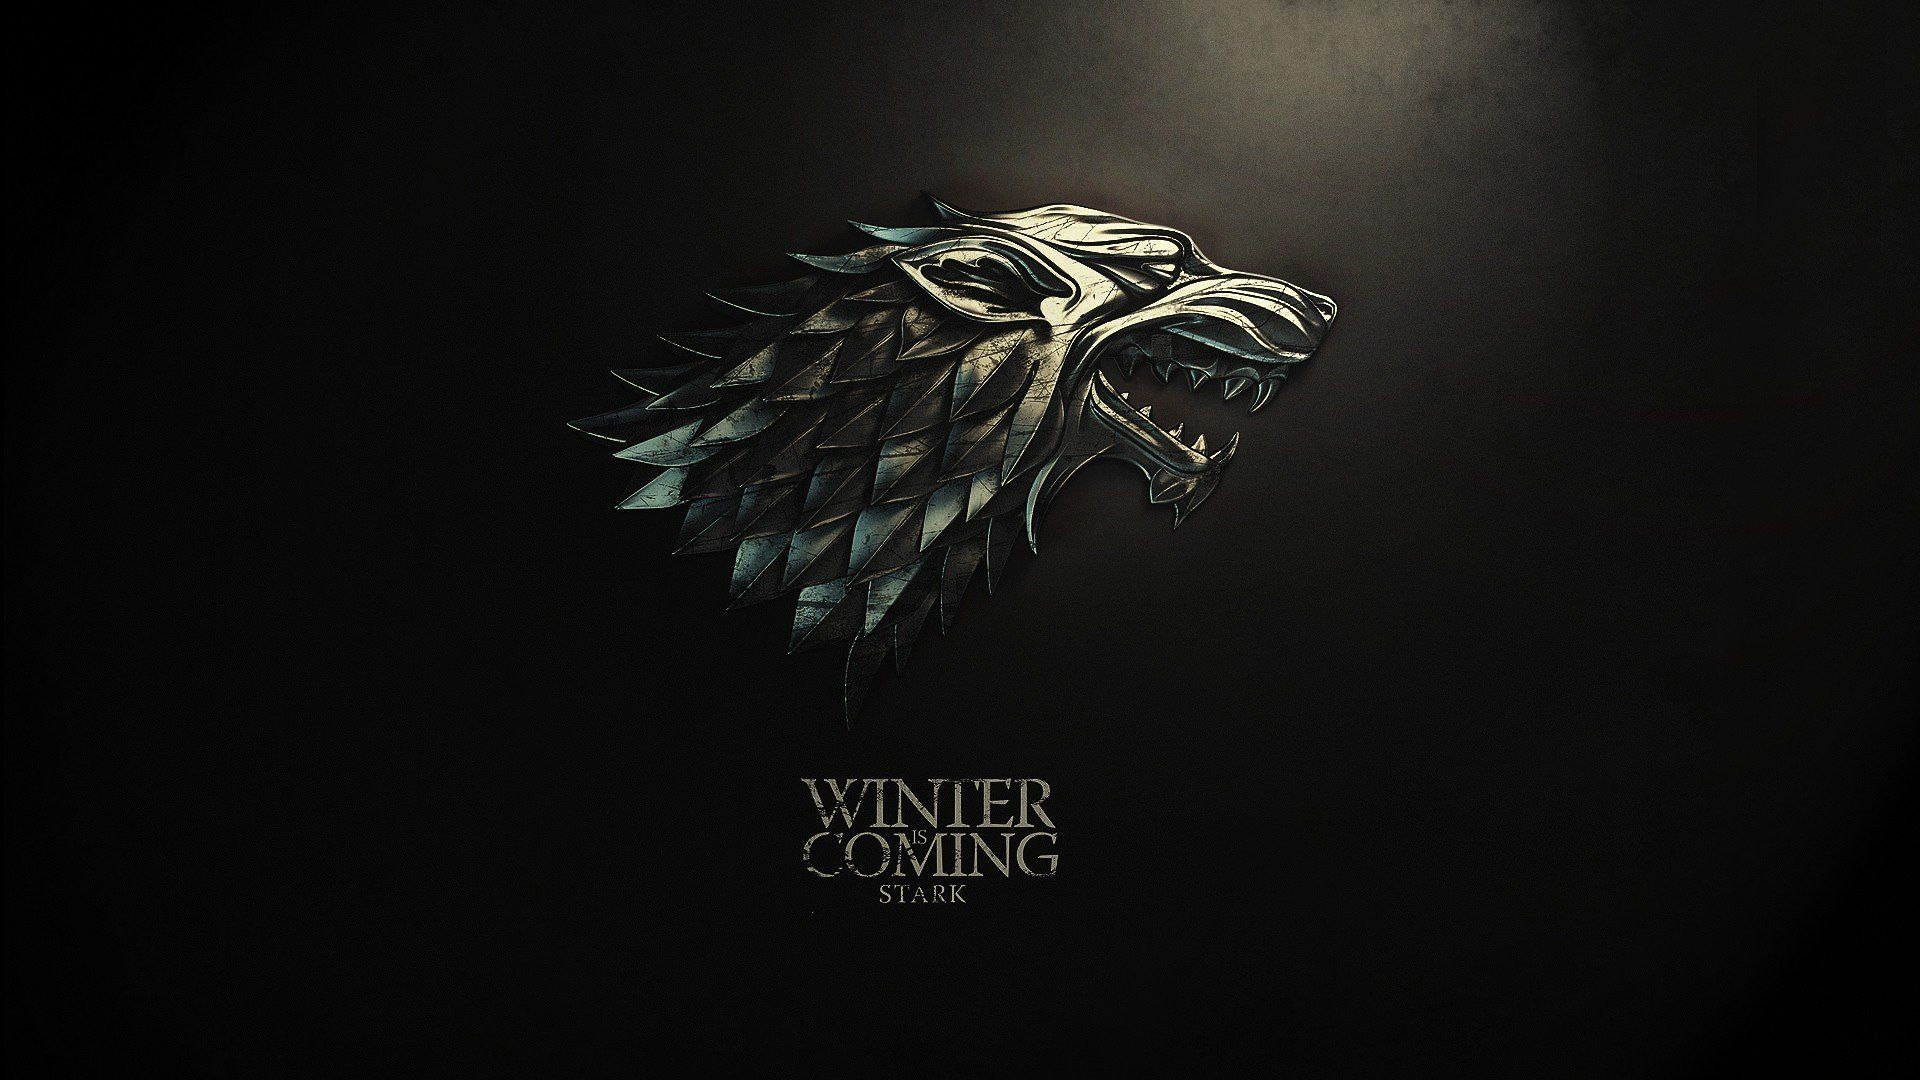 Valar Morghulis Arya Wallpaper Hd Wallpaper Game Of Thrones Winter Game Of Thrones Images